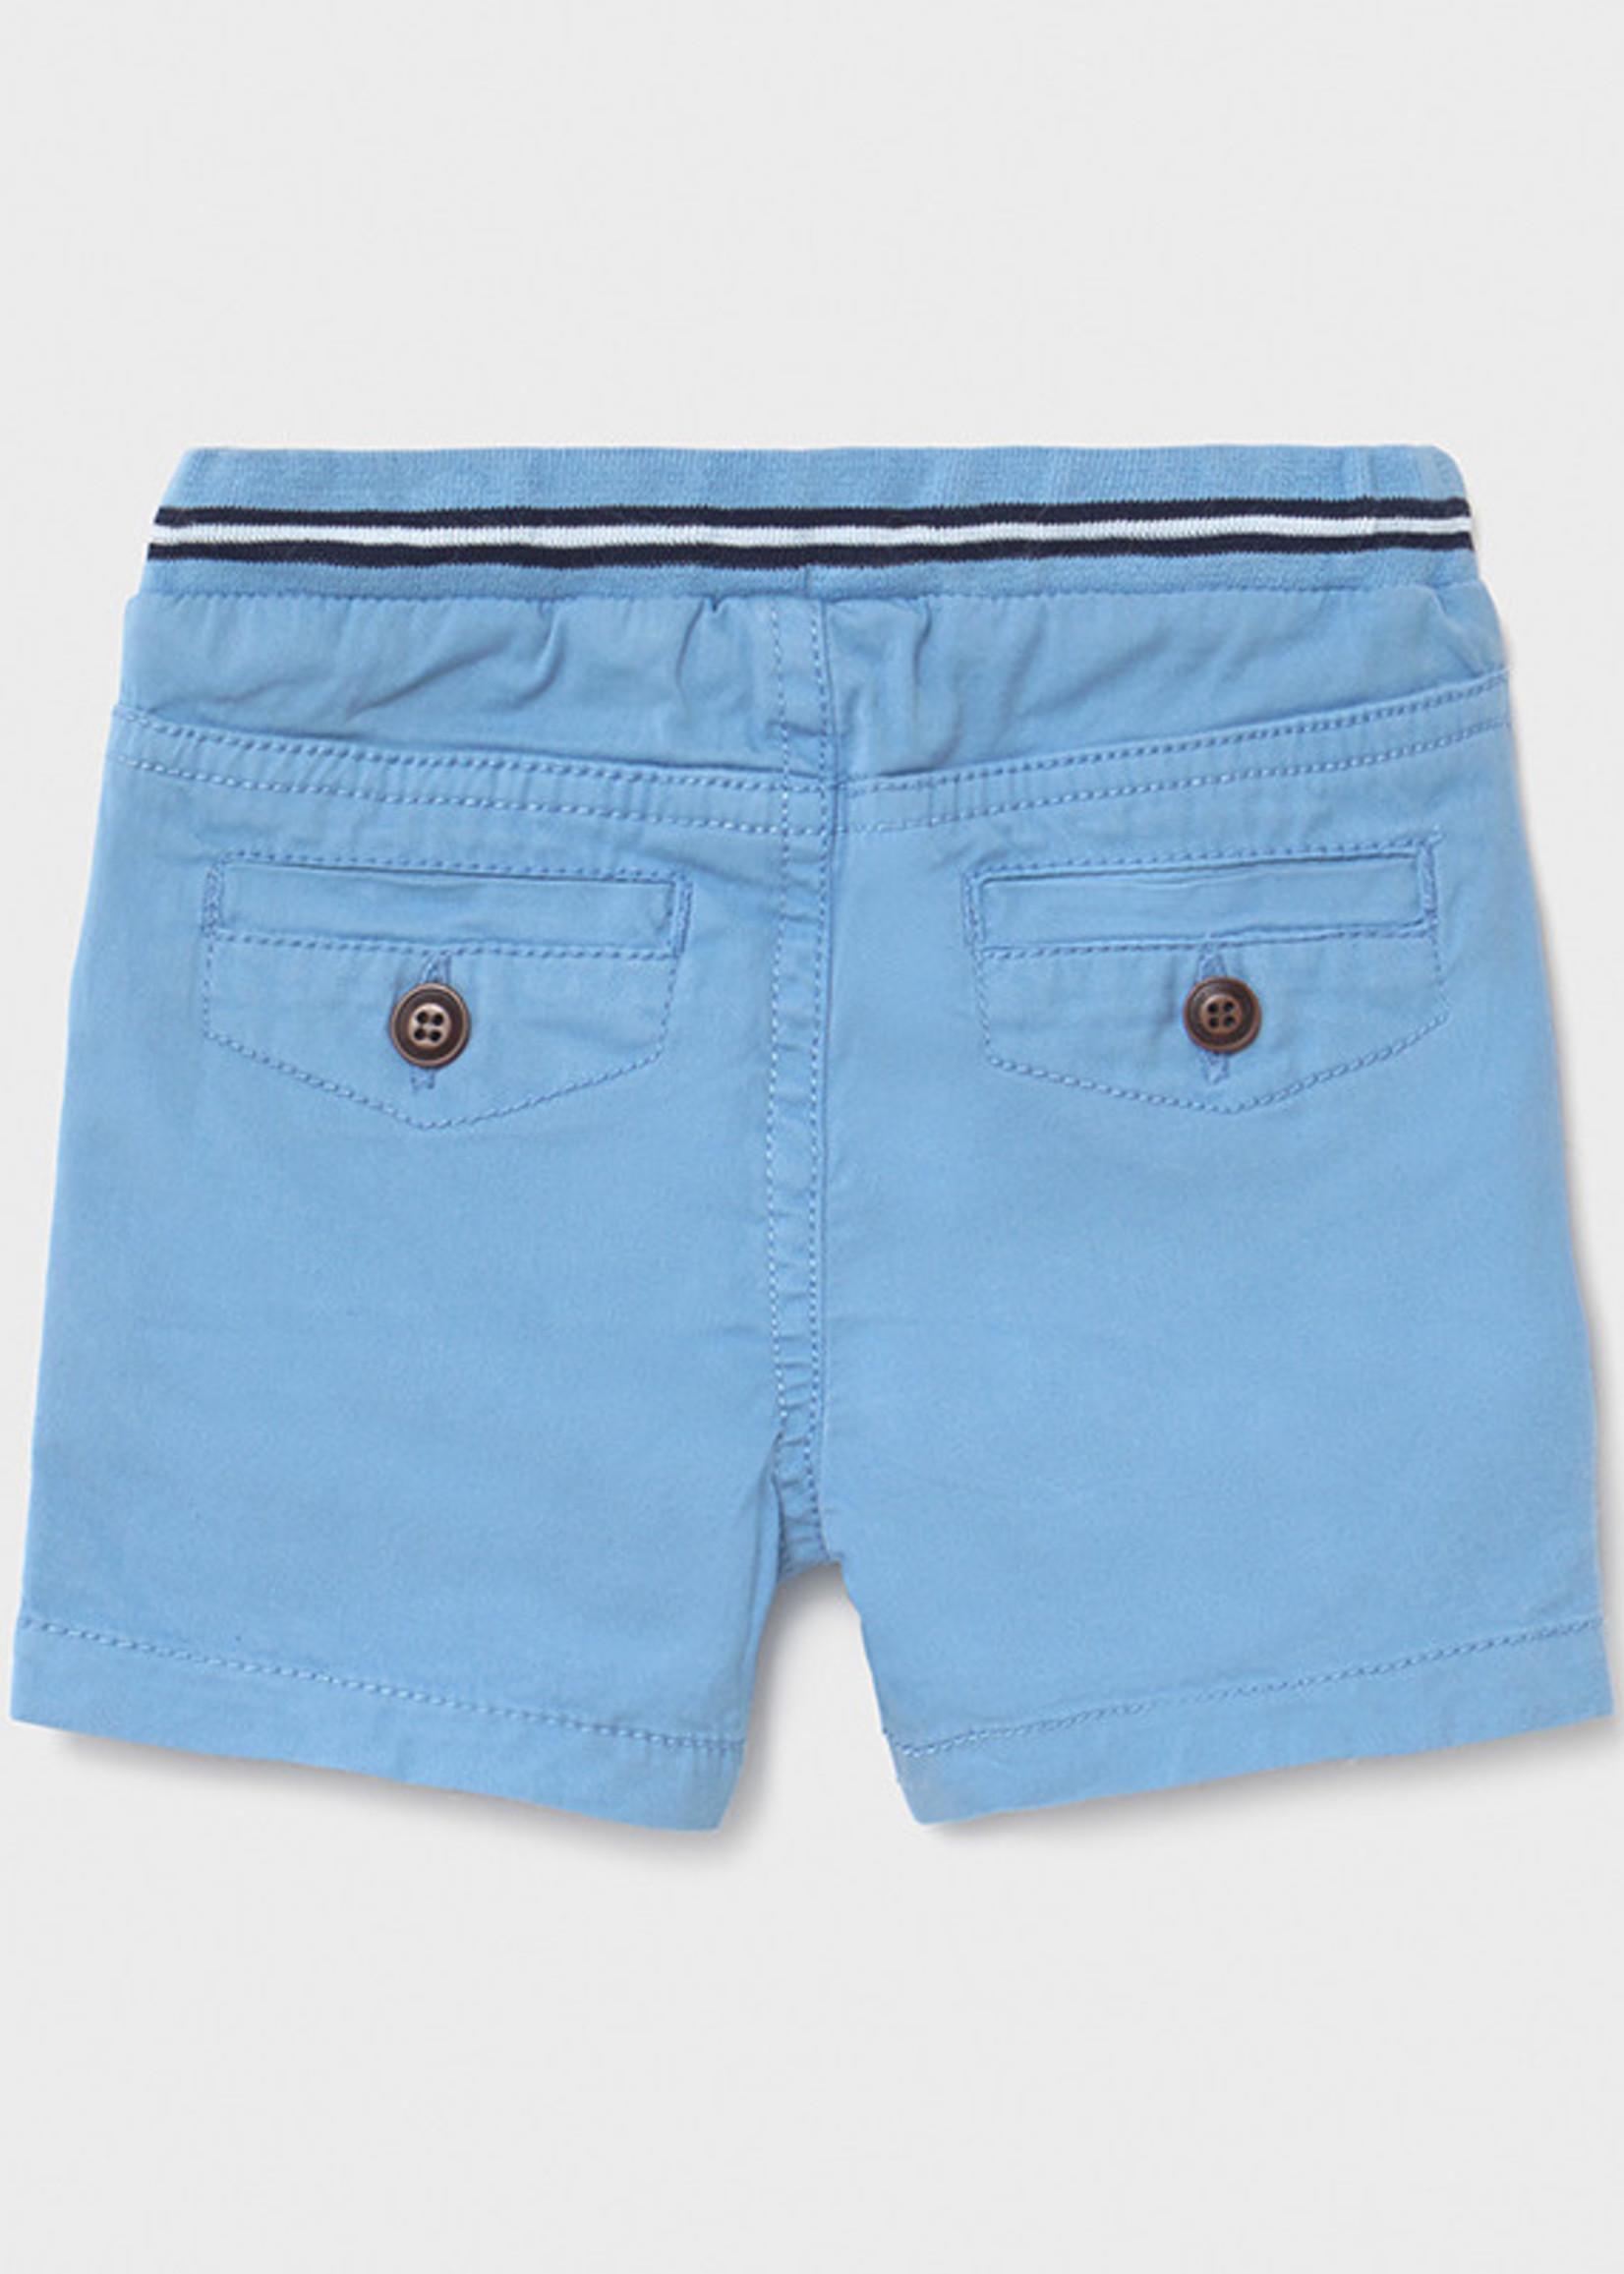 Mayoral Mayoral twill bermuda shorts